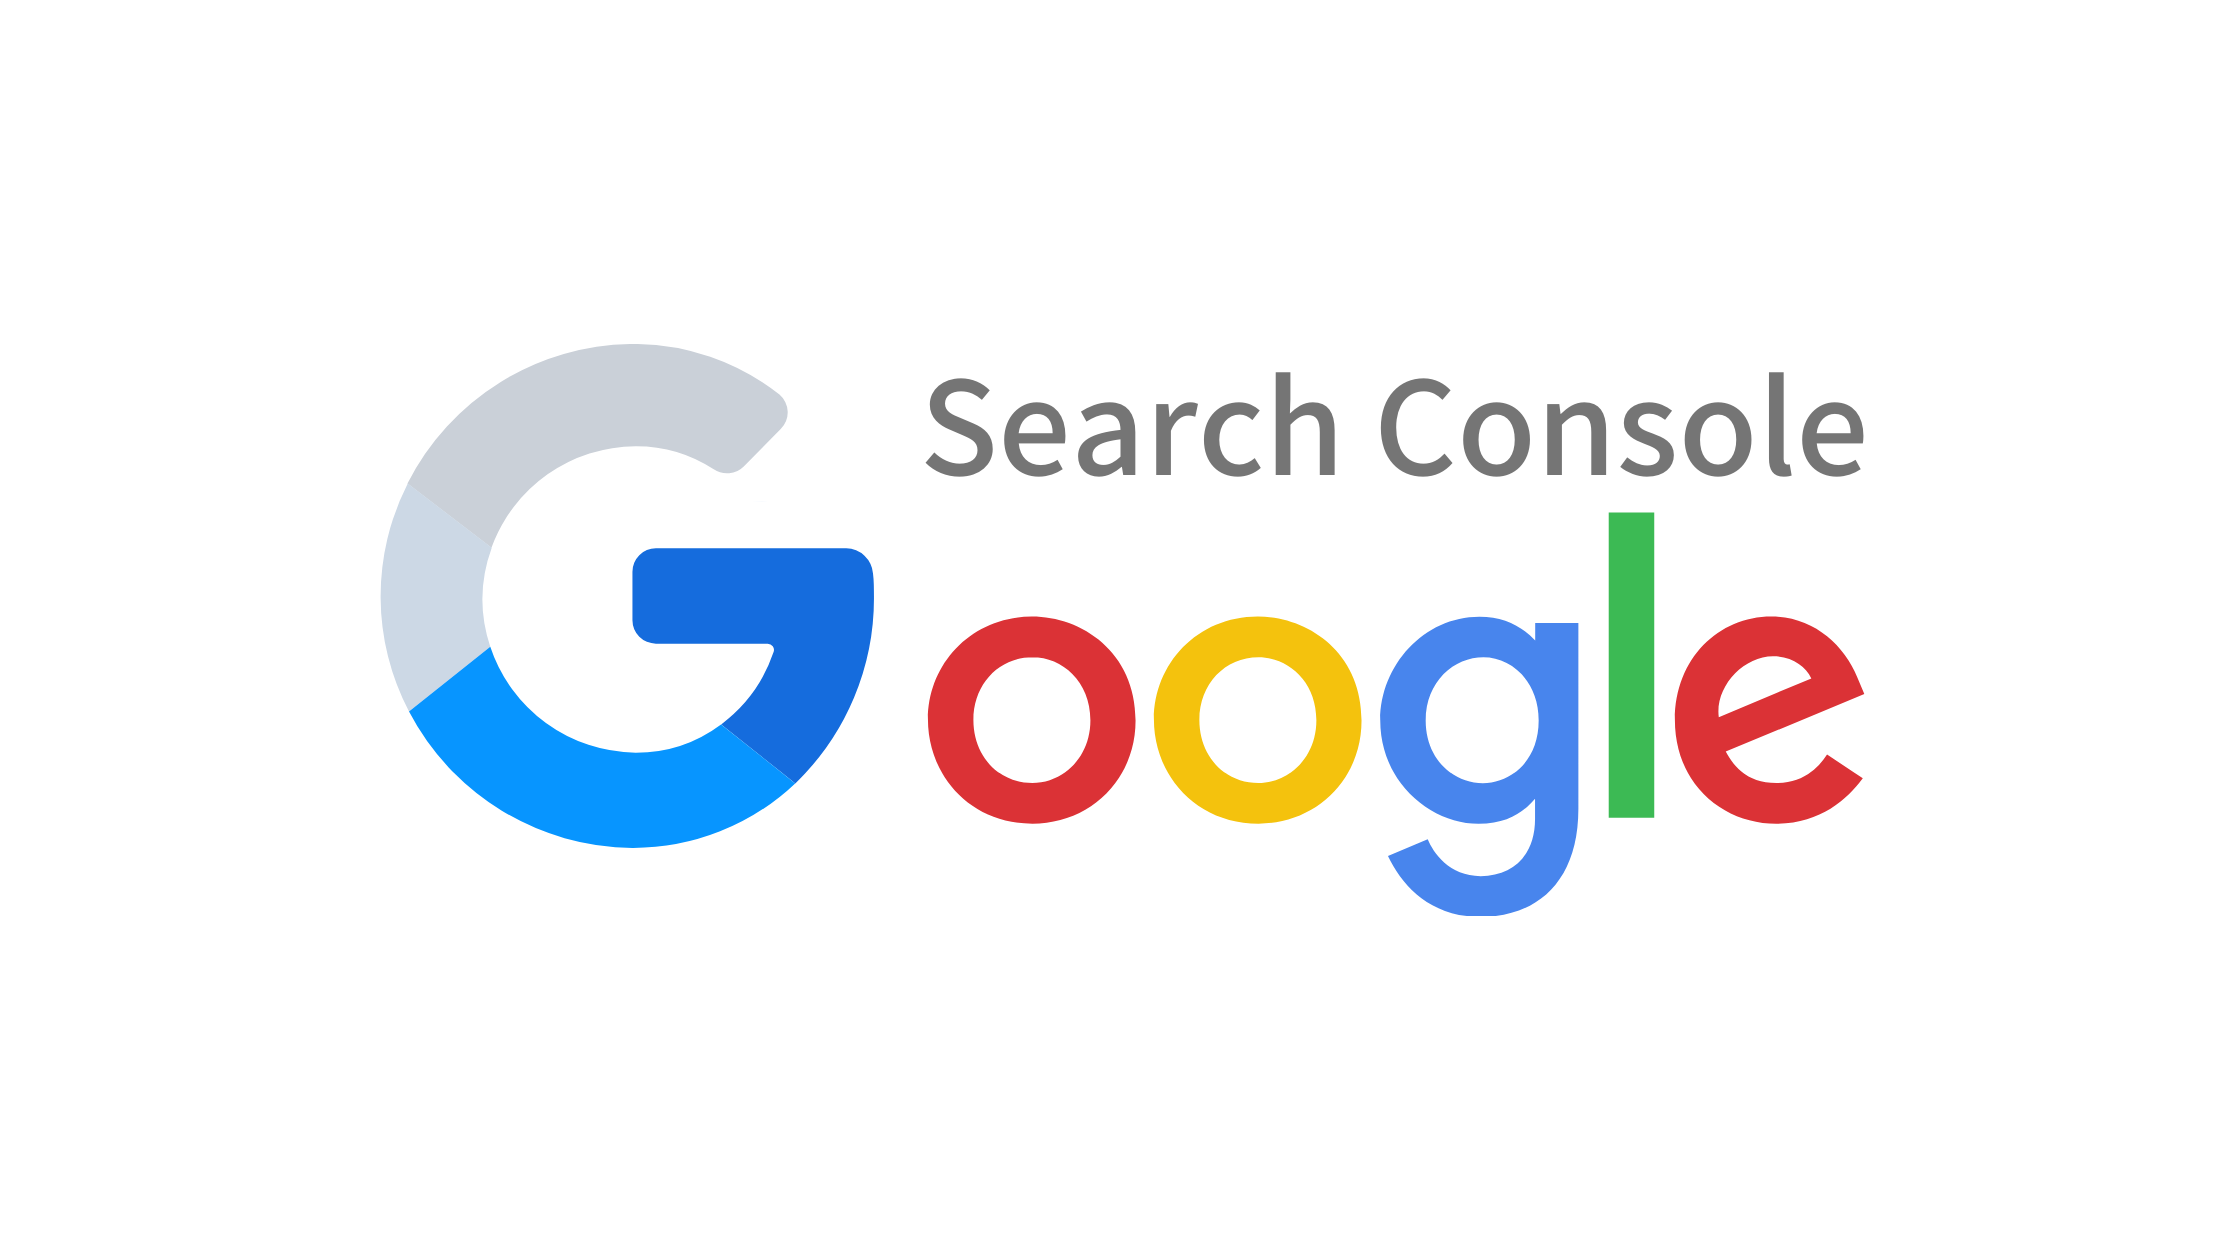 Google Search Console(グーグル サーチ コンソール)